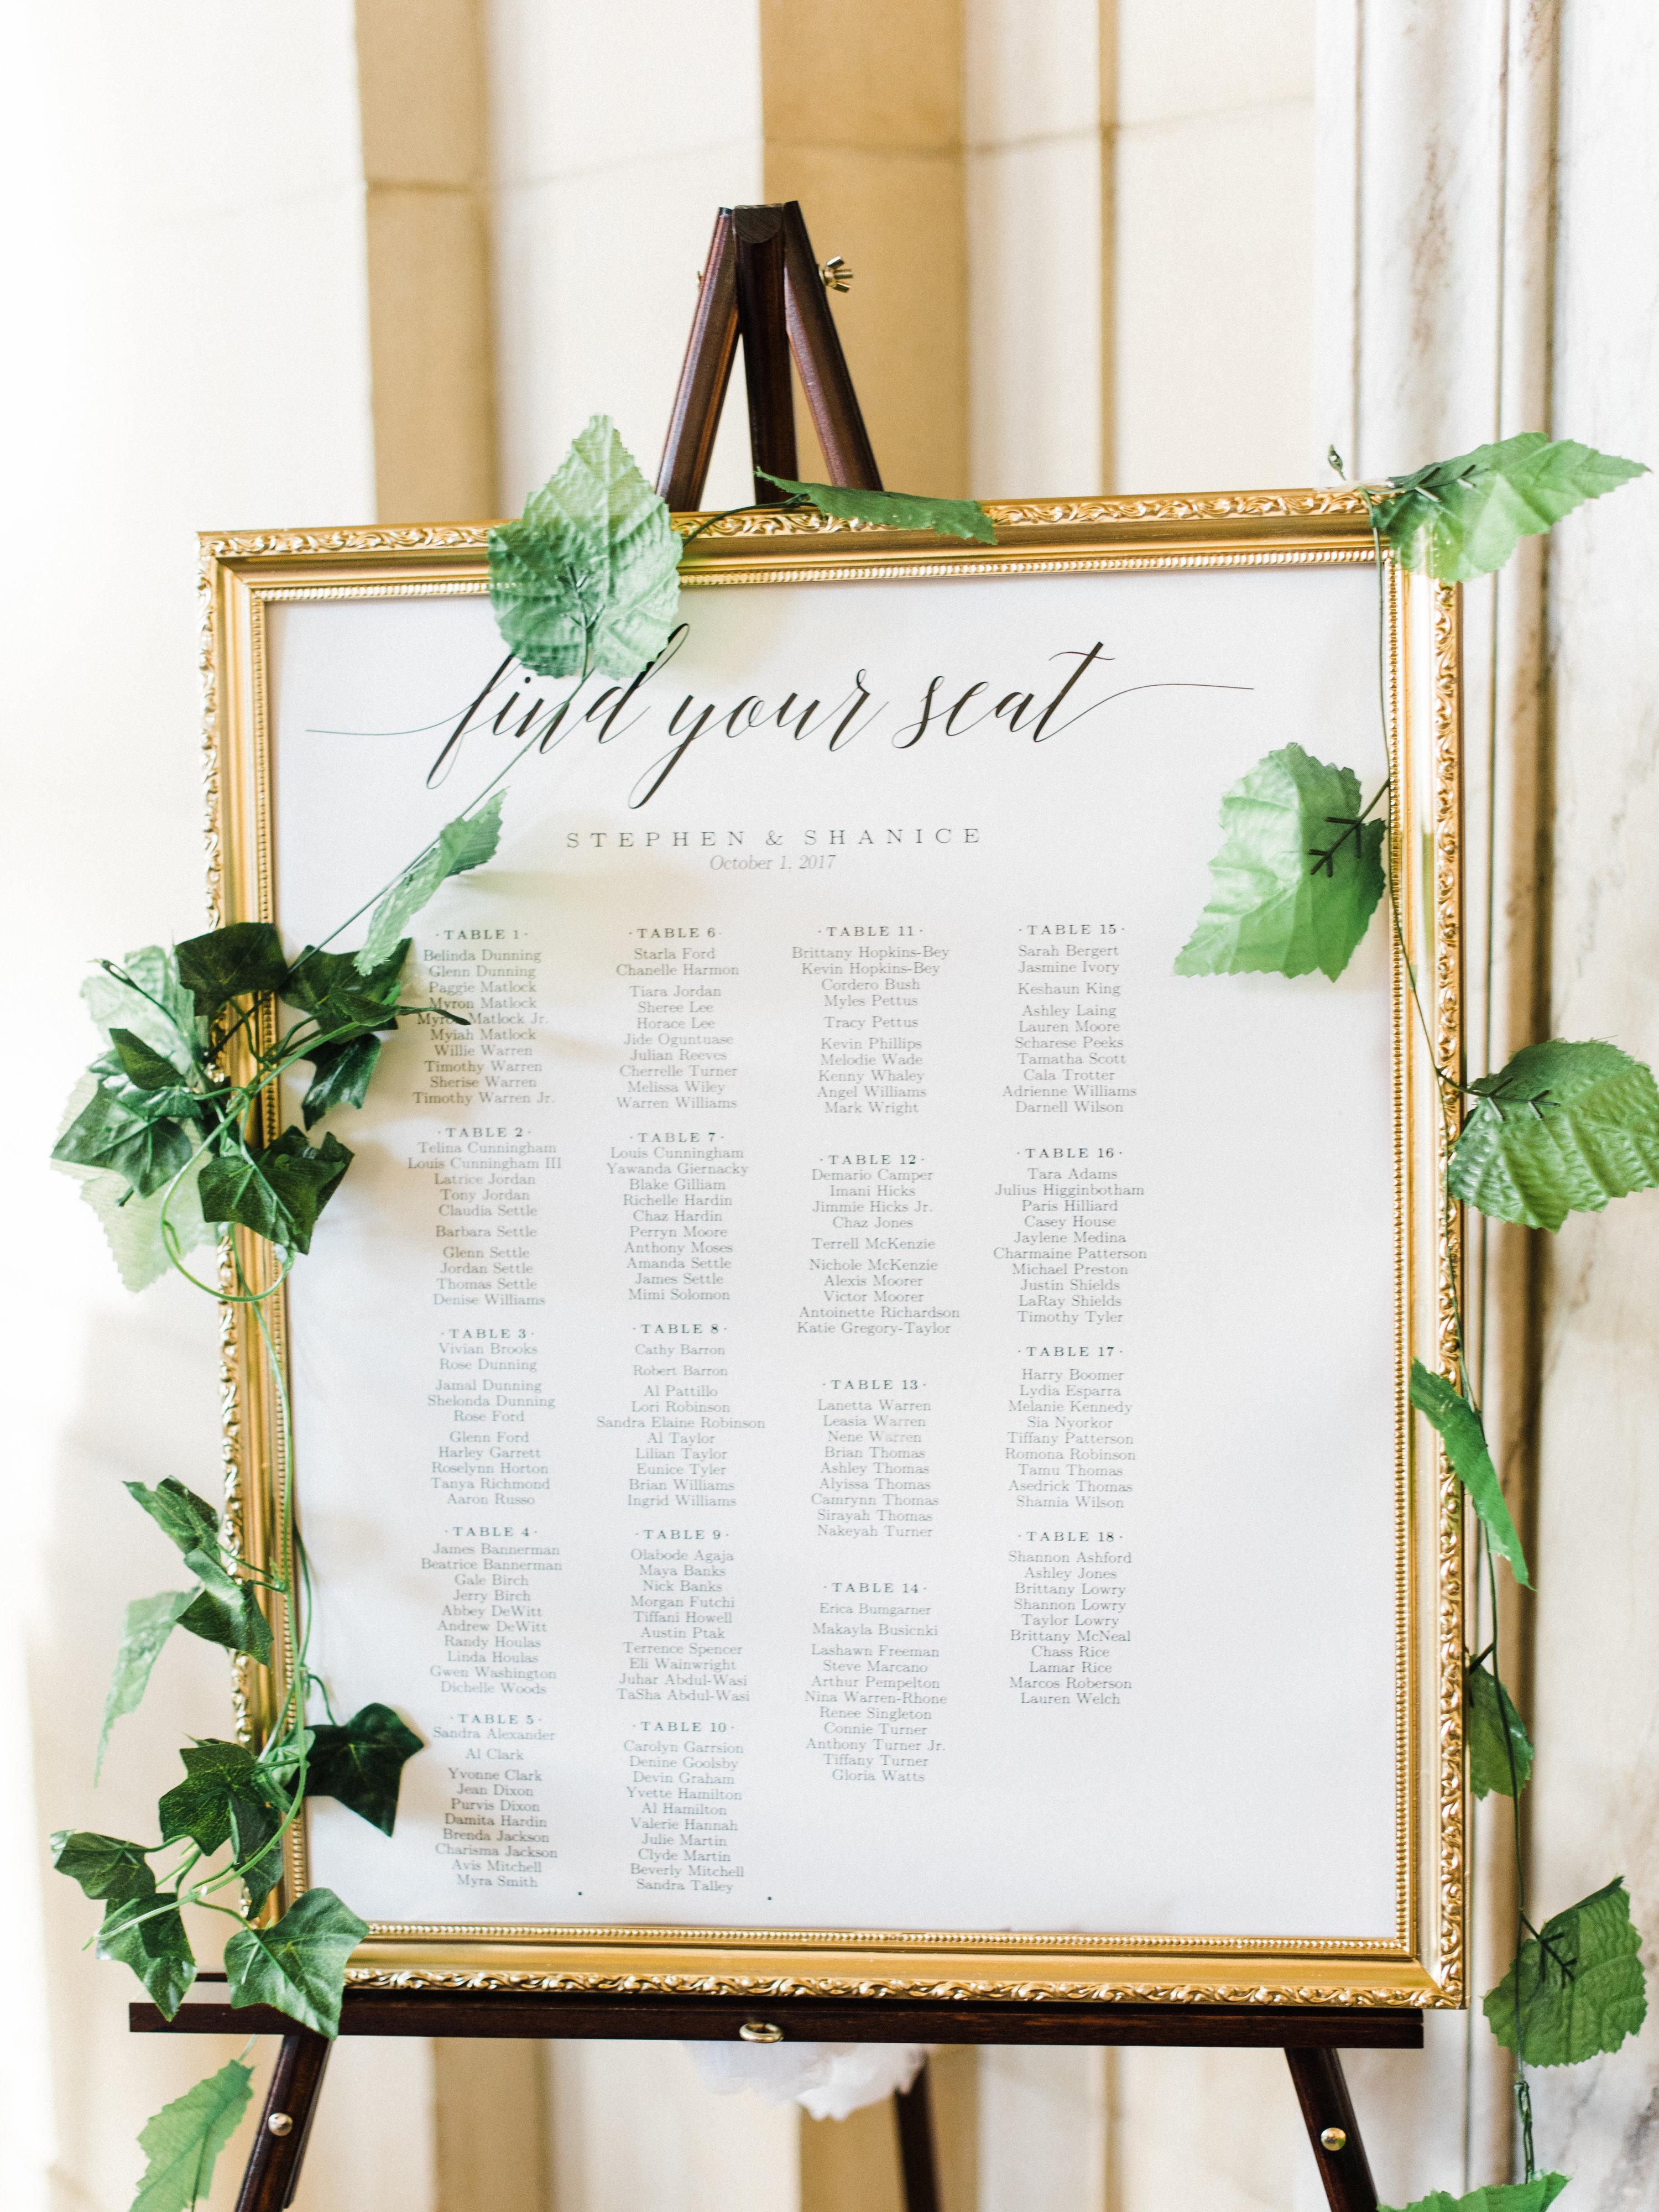 shanice & stephen wedding seating chart